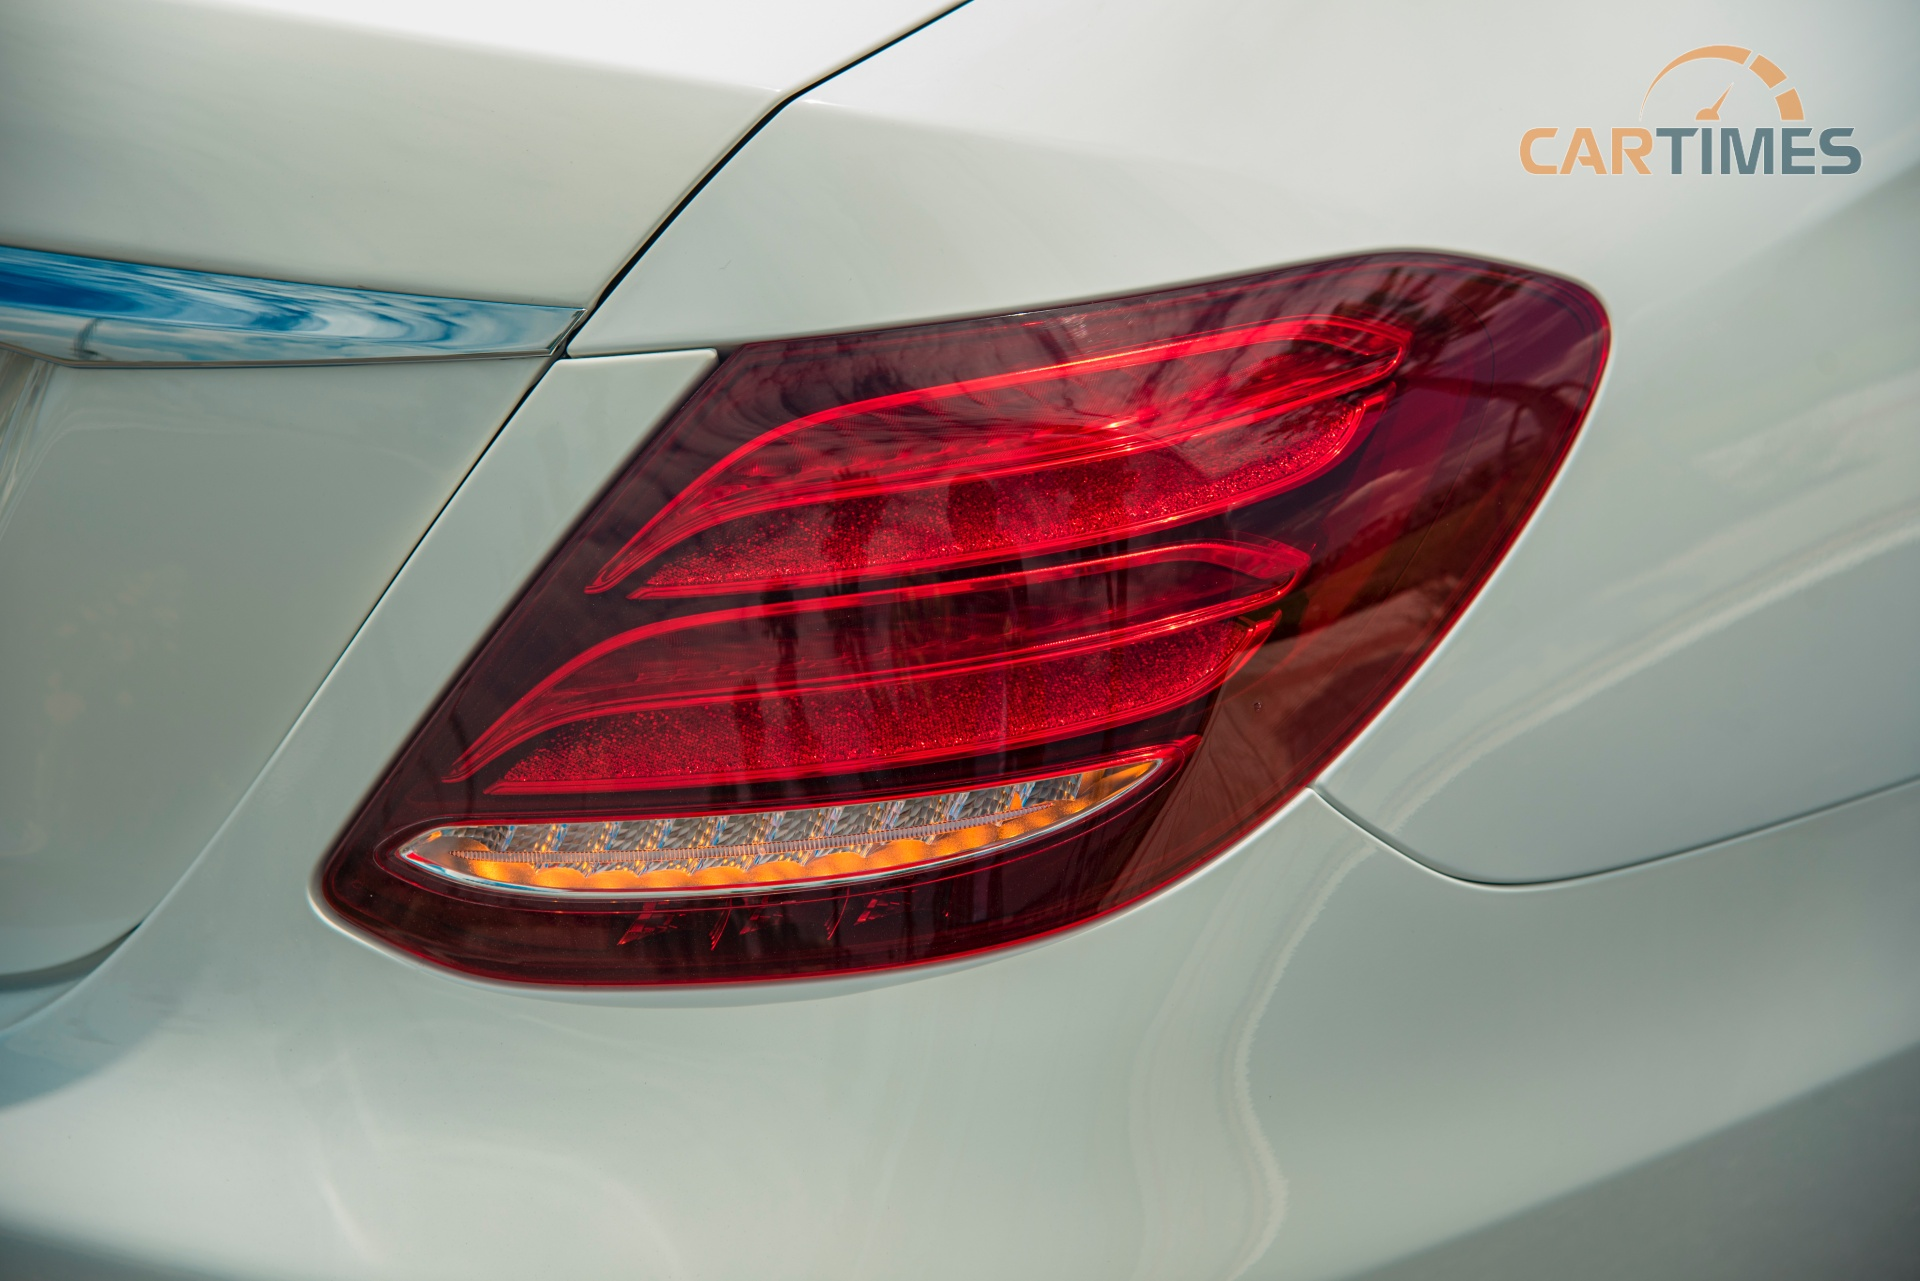 Đèn hậu xe Mercedes-Benz E 200 Sport